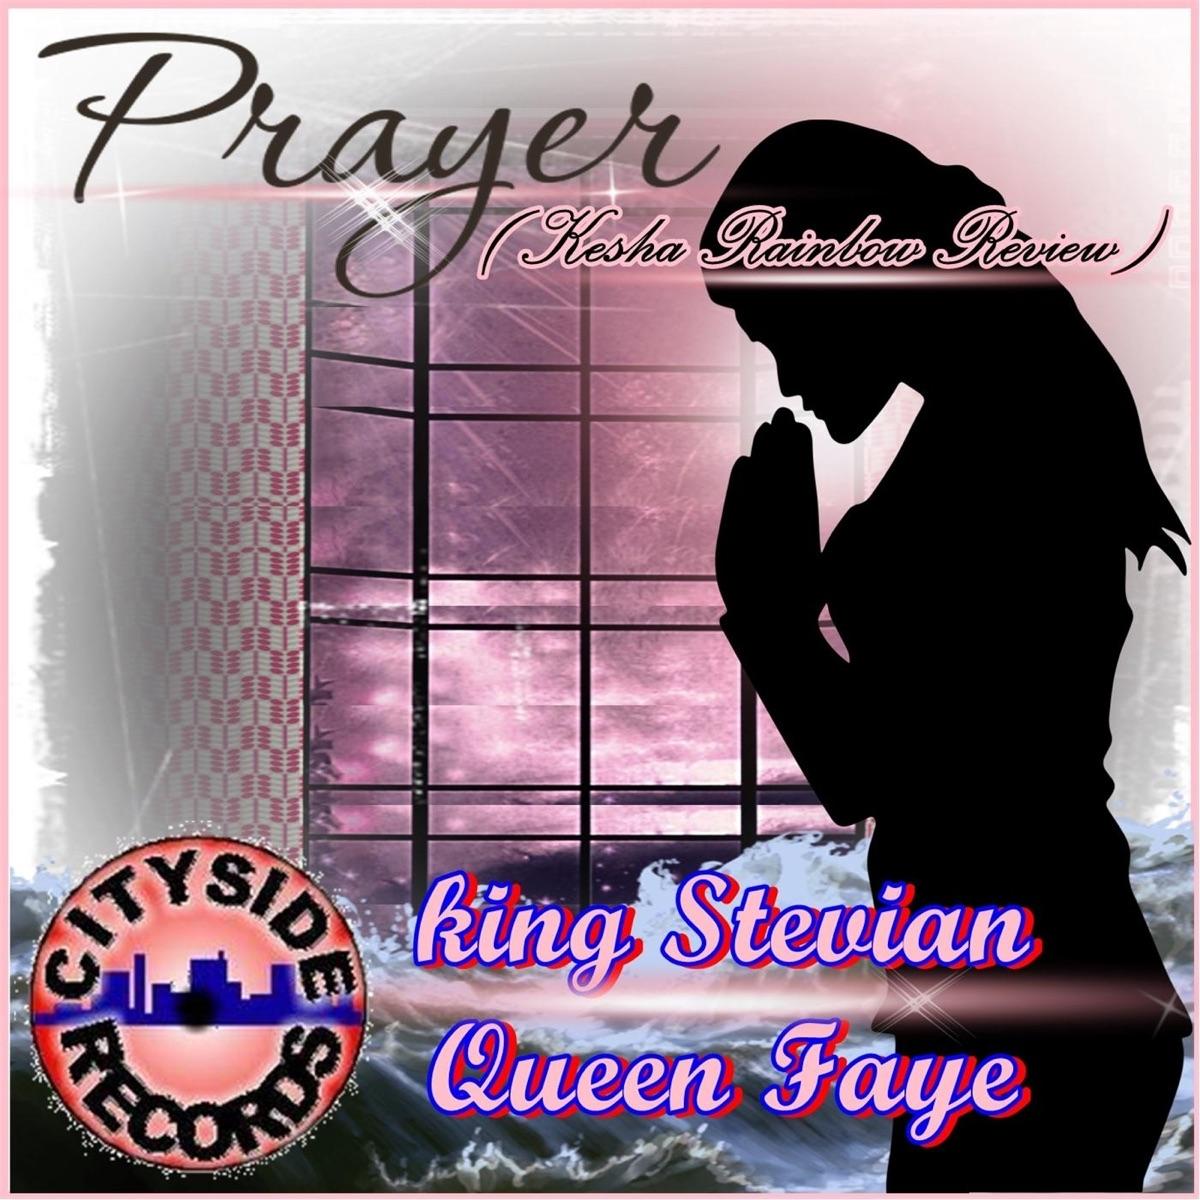 Prayer Kesha Rainbow Review - Single King Stevian  Queen Faye CD cover